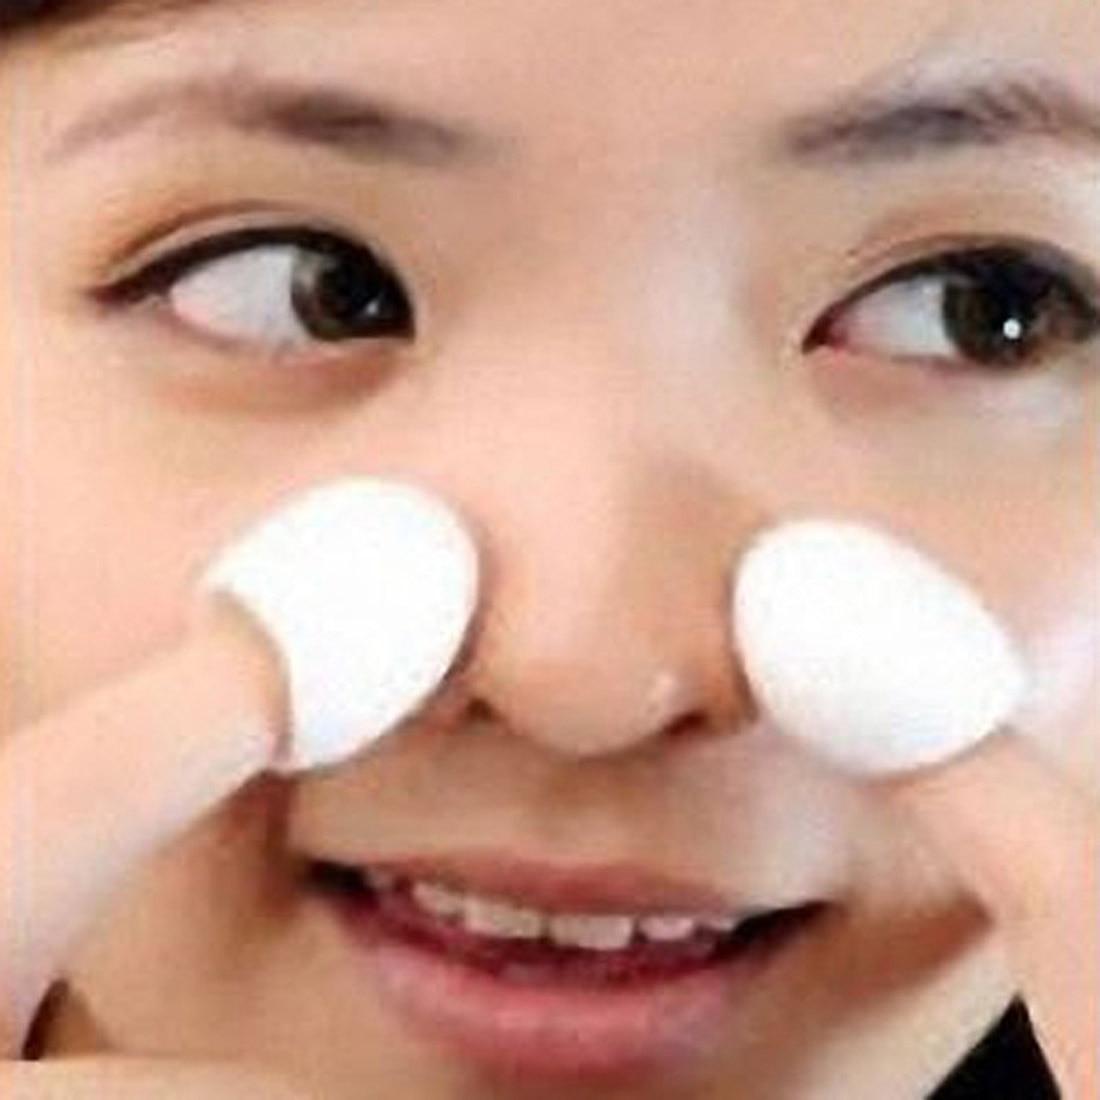 30PCS Organic Silkworm Balls Purifying Whitening Exfoliating Scrub Blackhead Acne Remover Natural Silk Cocoons Facial Skin Care 6